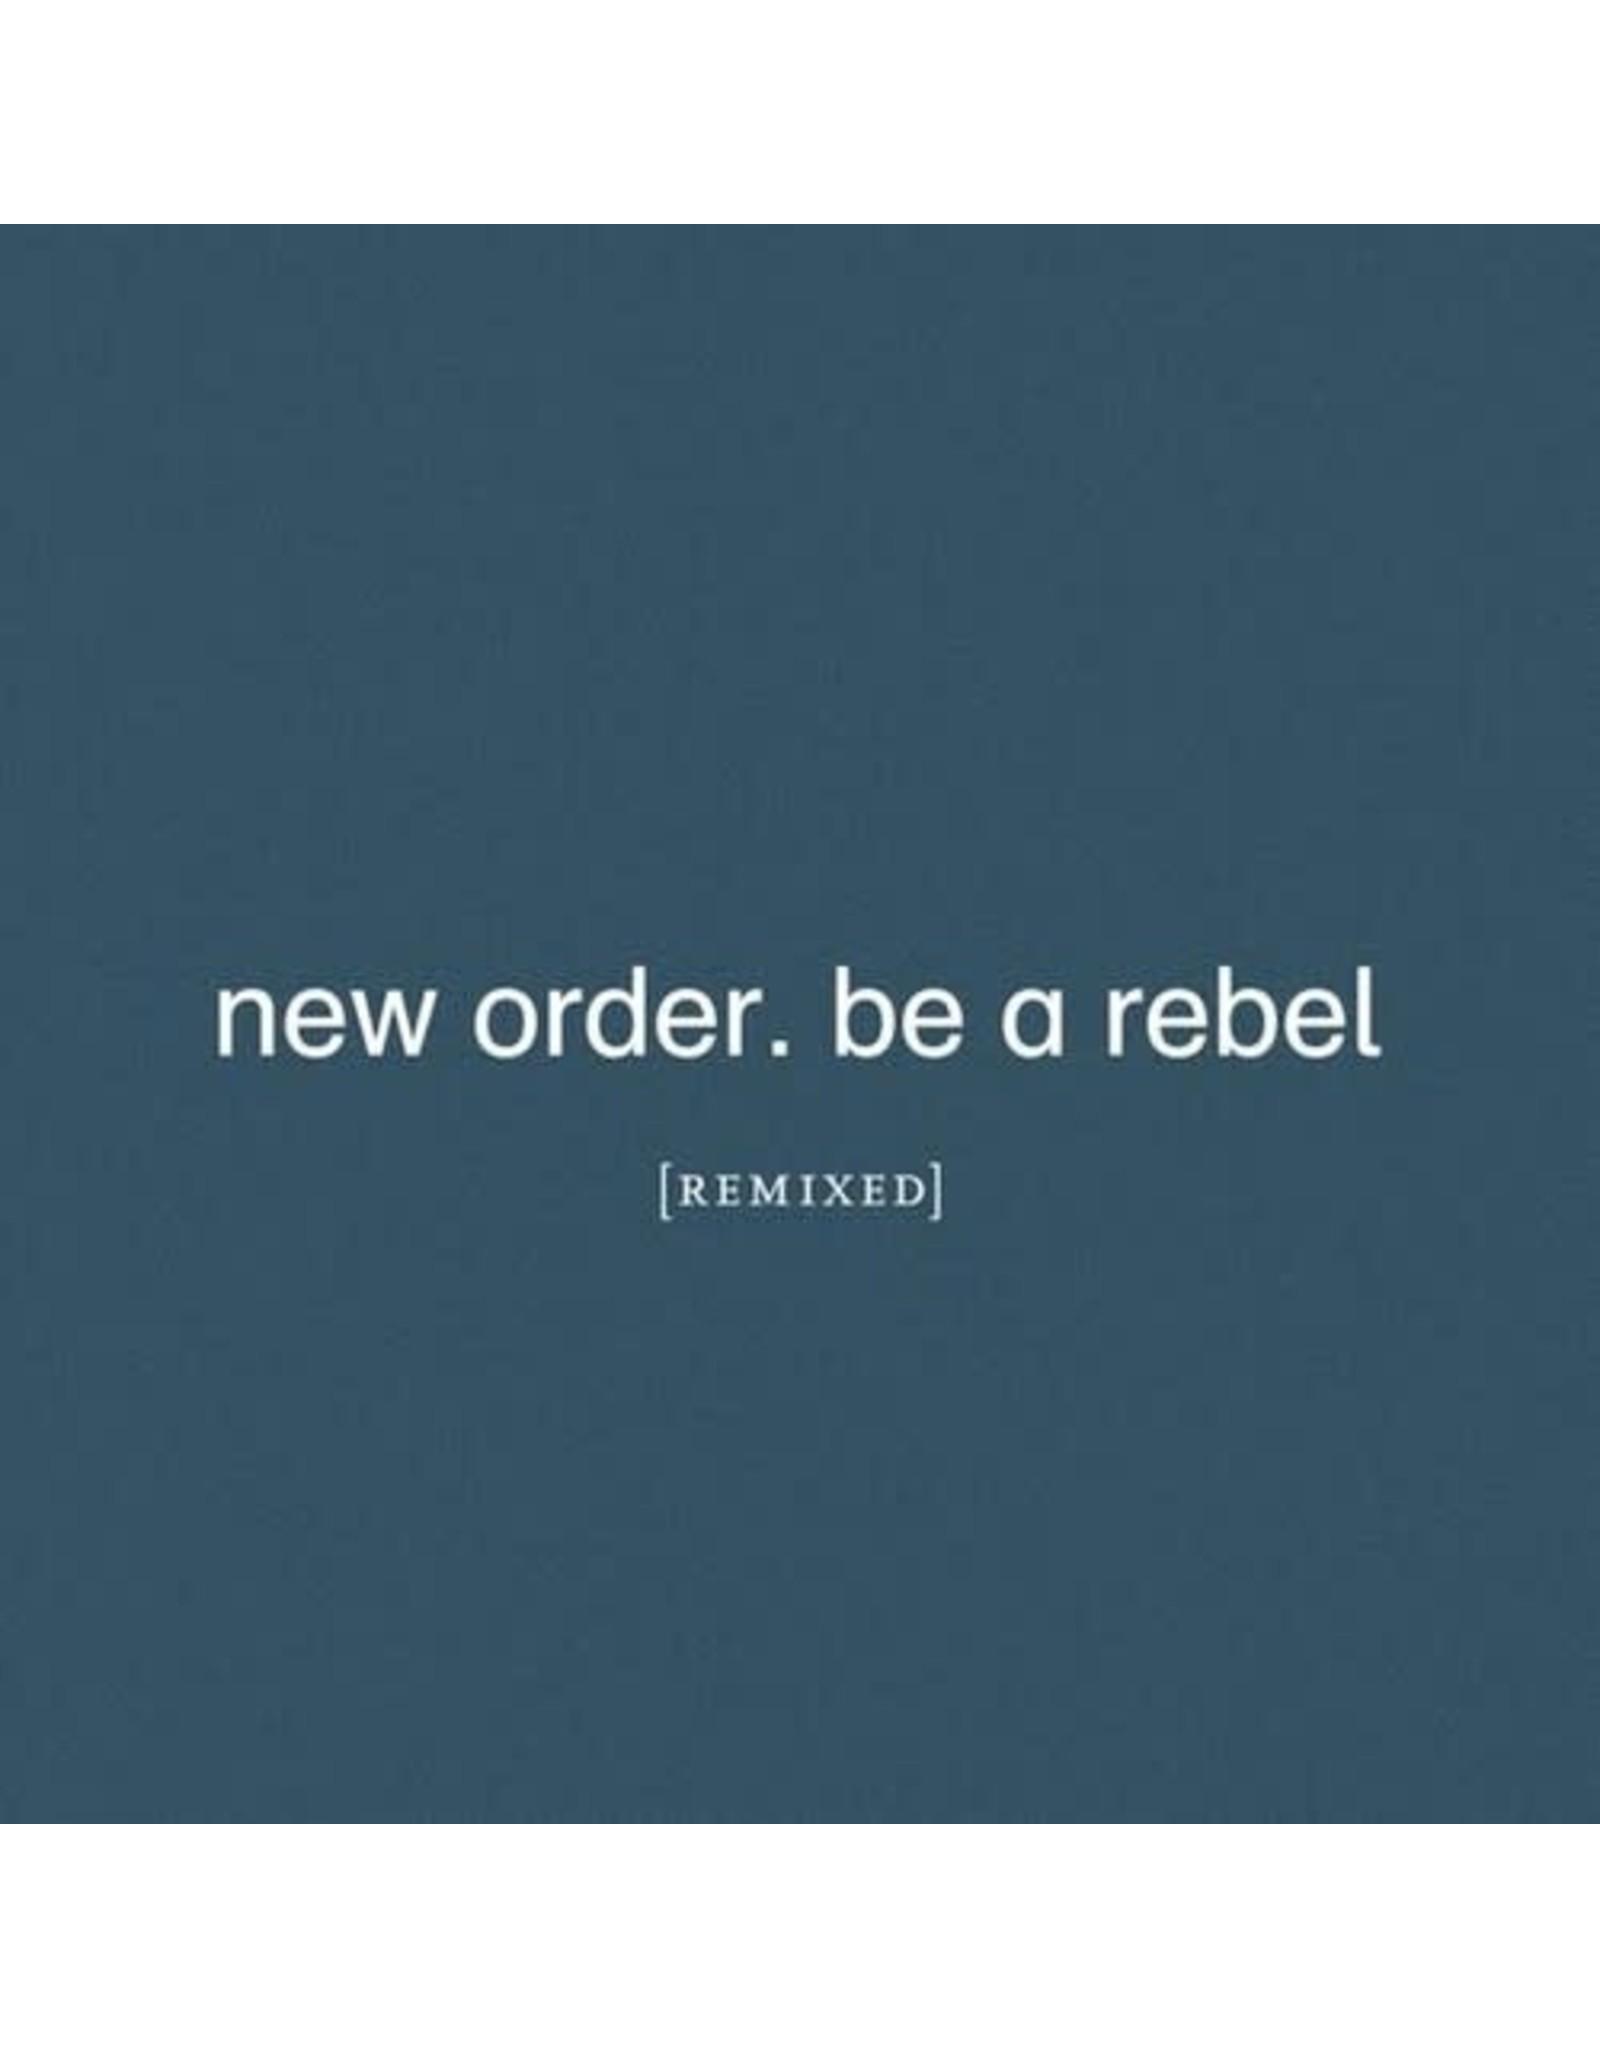 New Vinyl New Order - Be A Rebel Remixed (Clear) 2LP